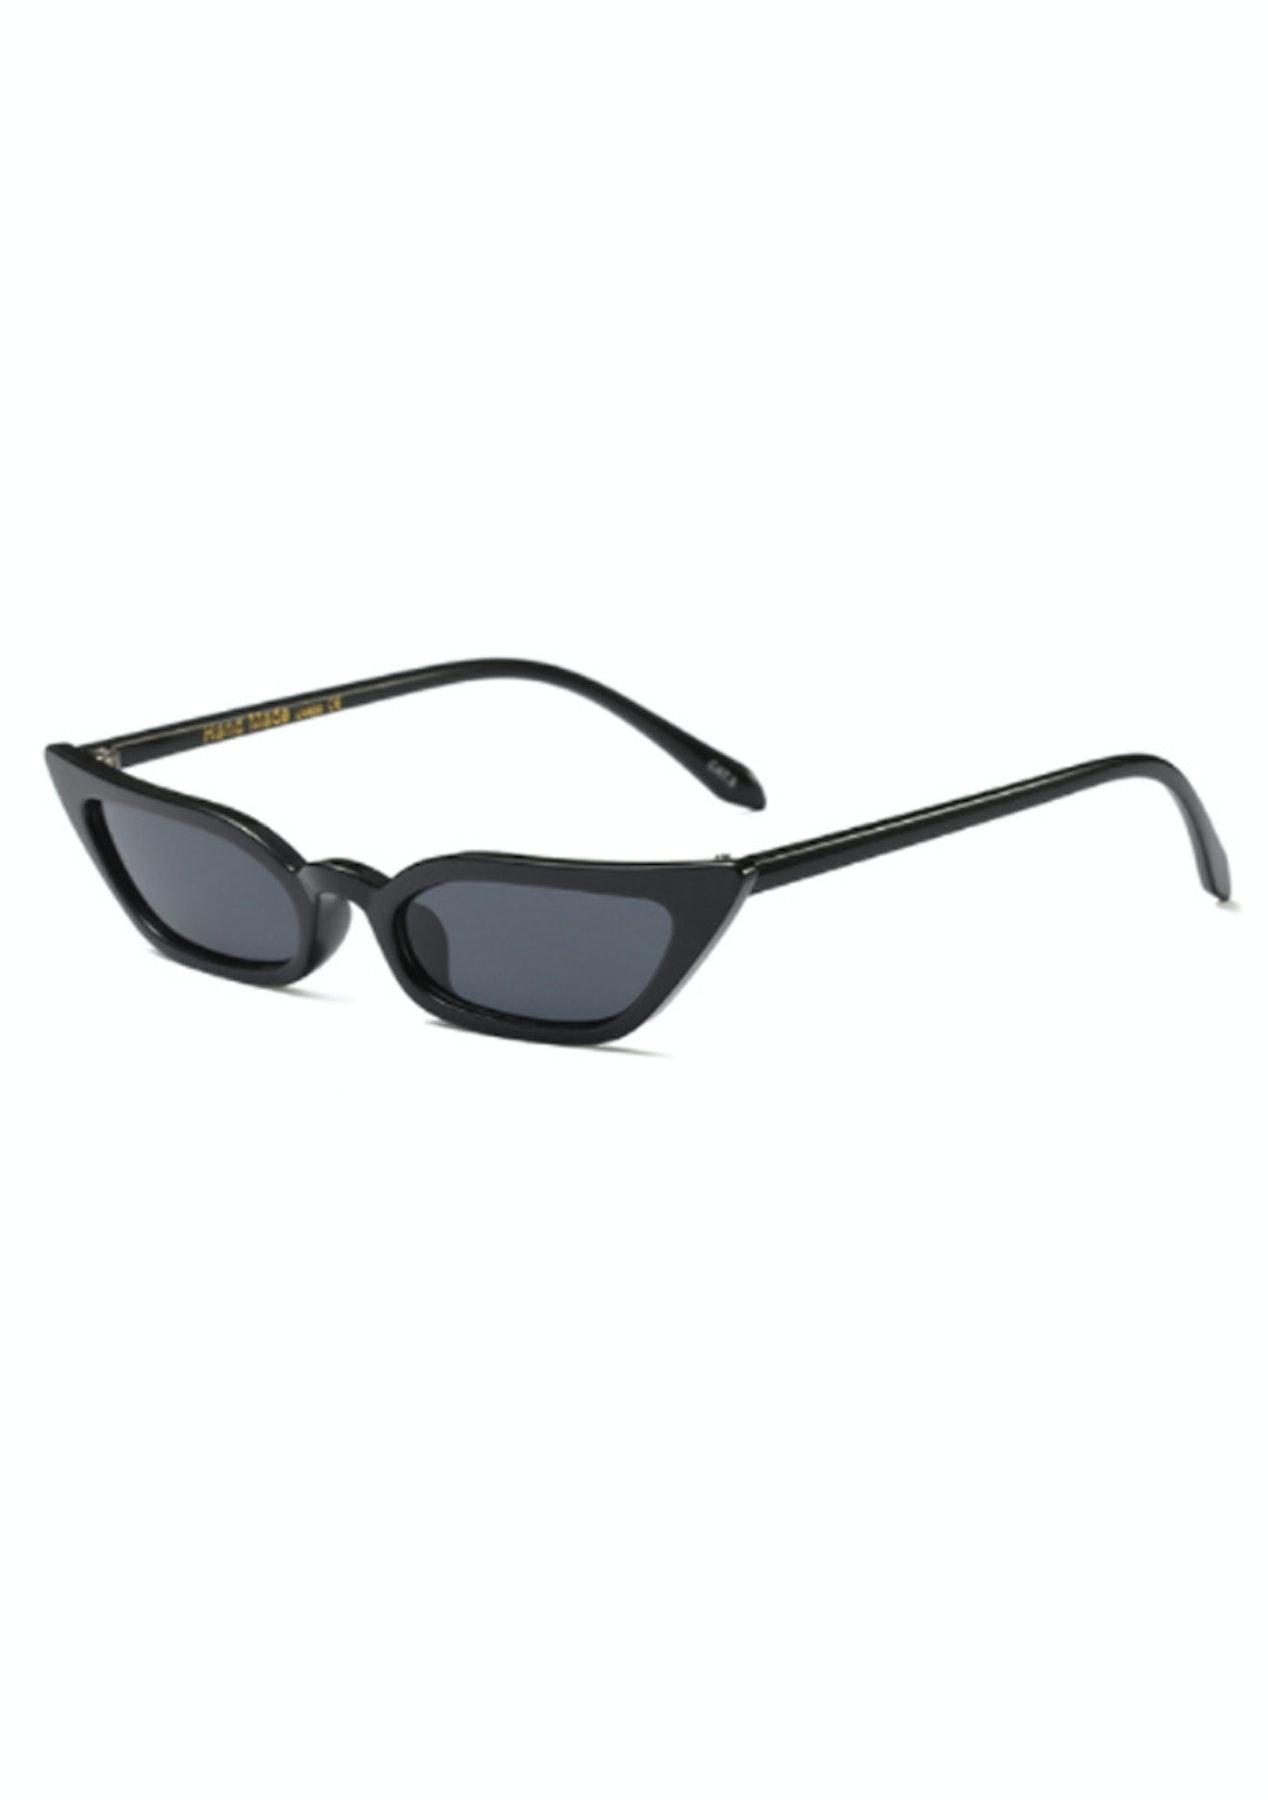 d8085f3d7a1 Slim Cat Eye Sunglasses - Black - On Trend Sunnies   Bags - Onceit